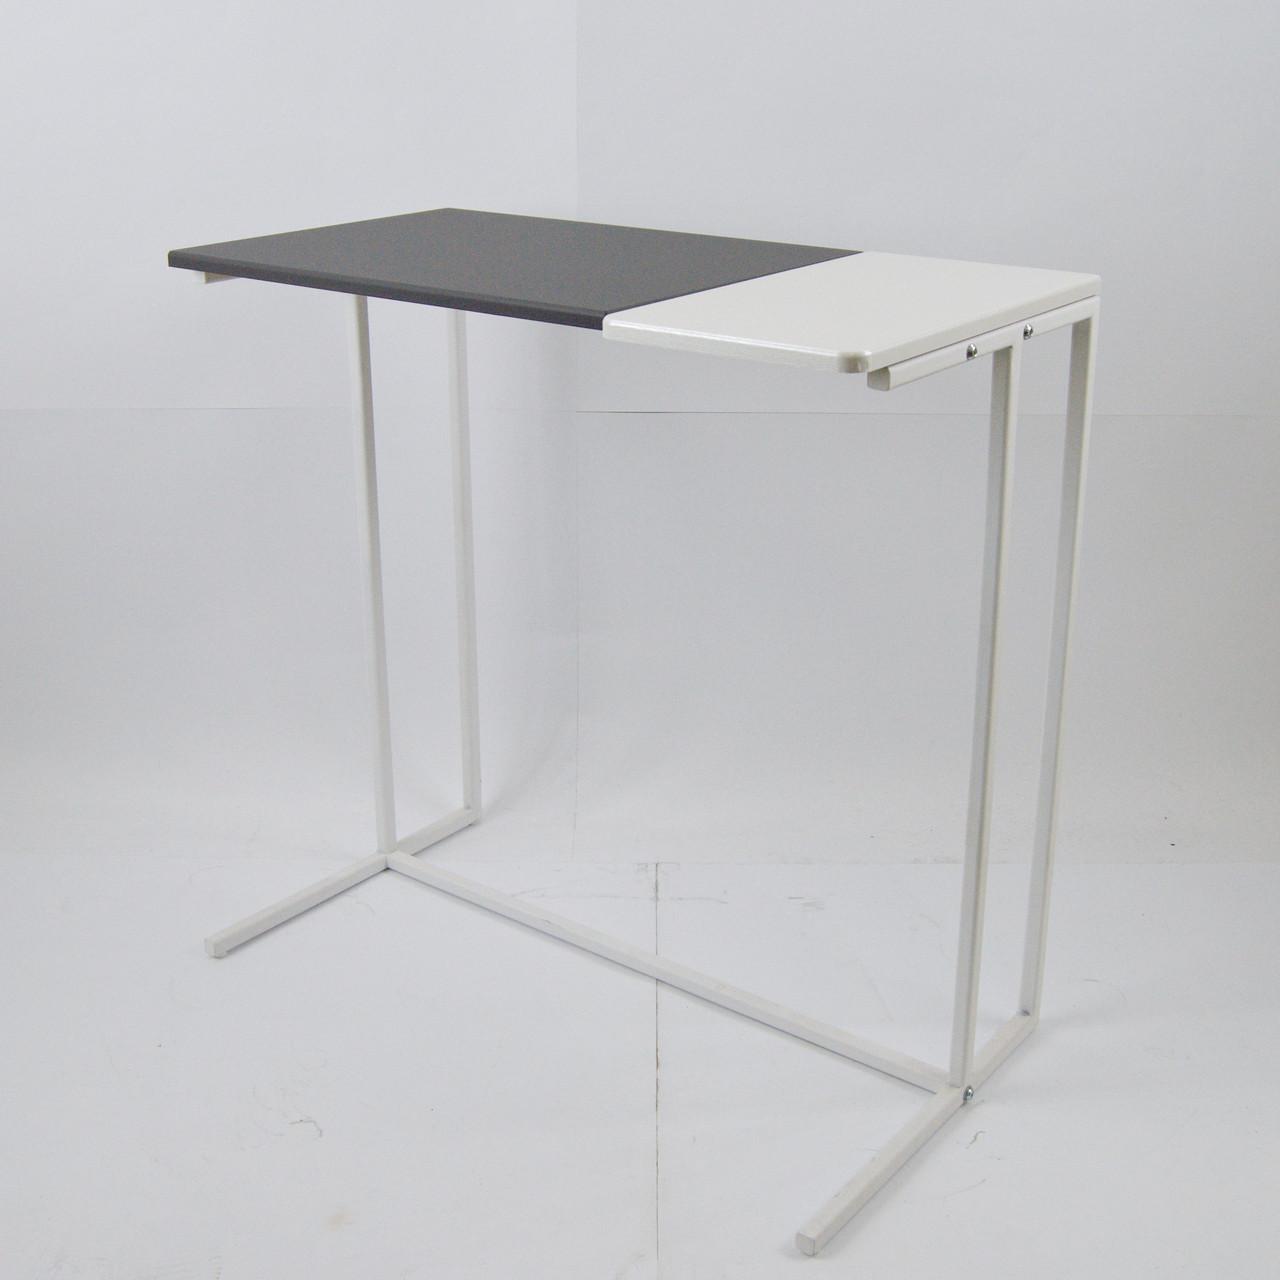 Стол приставной для предметов комфорта и IT-техники Commus Comfort A600 gray/white/white